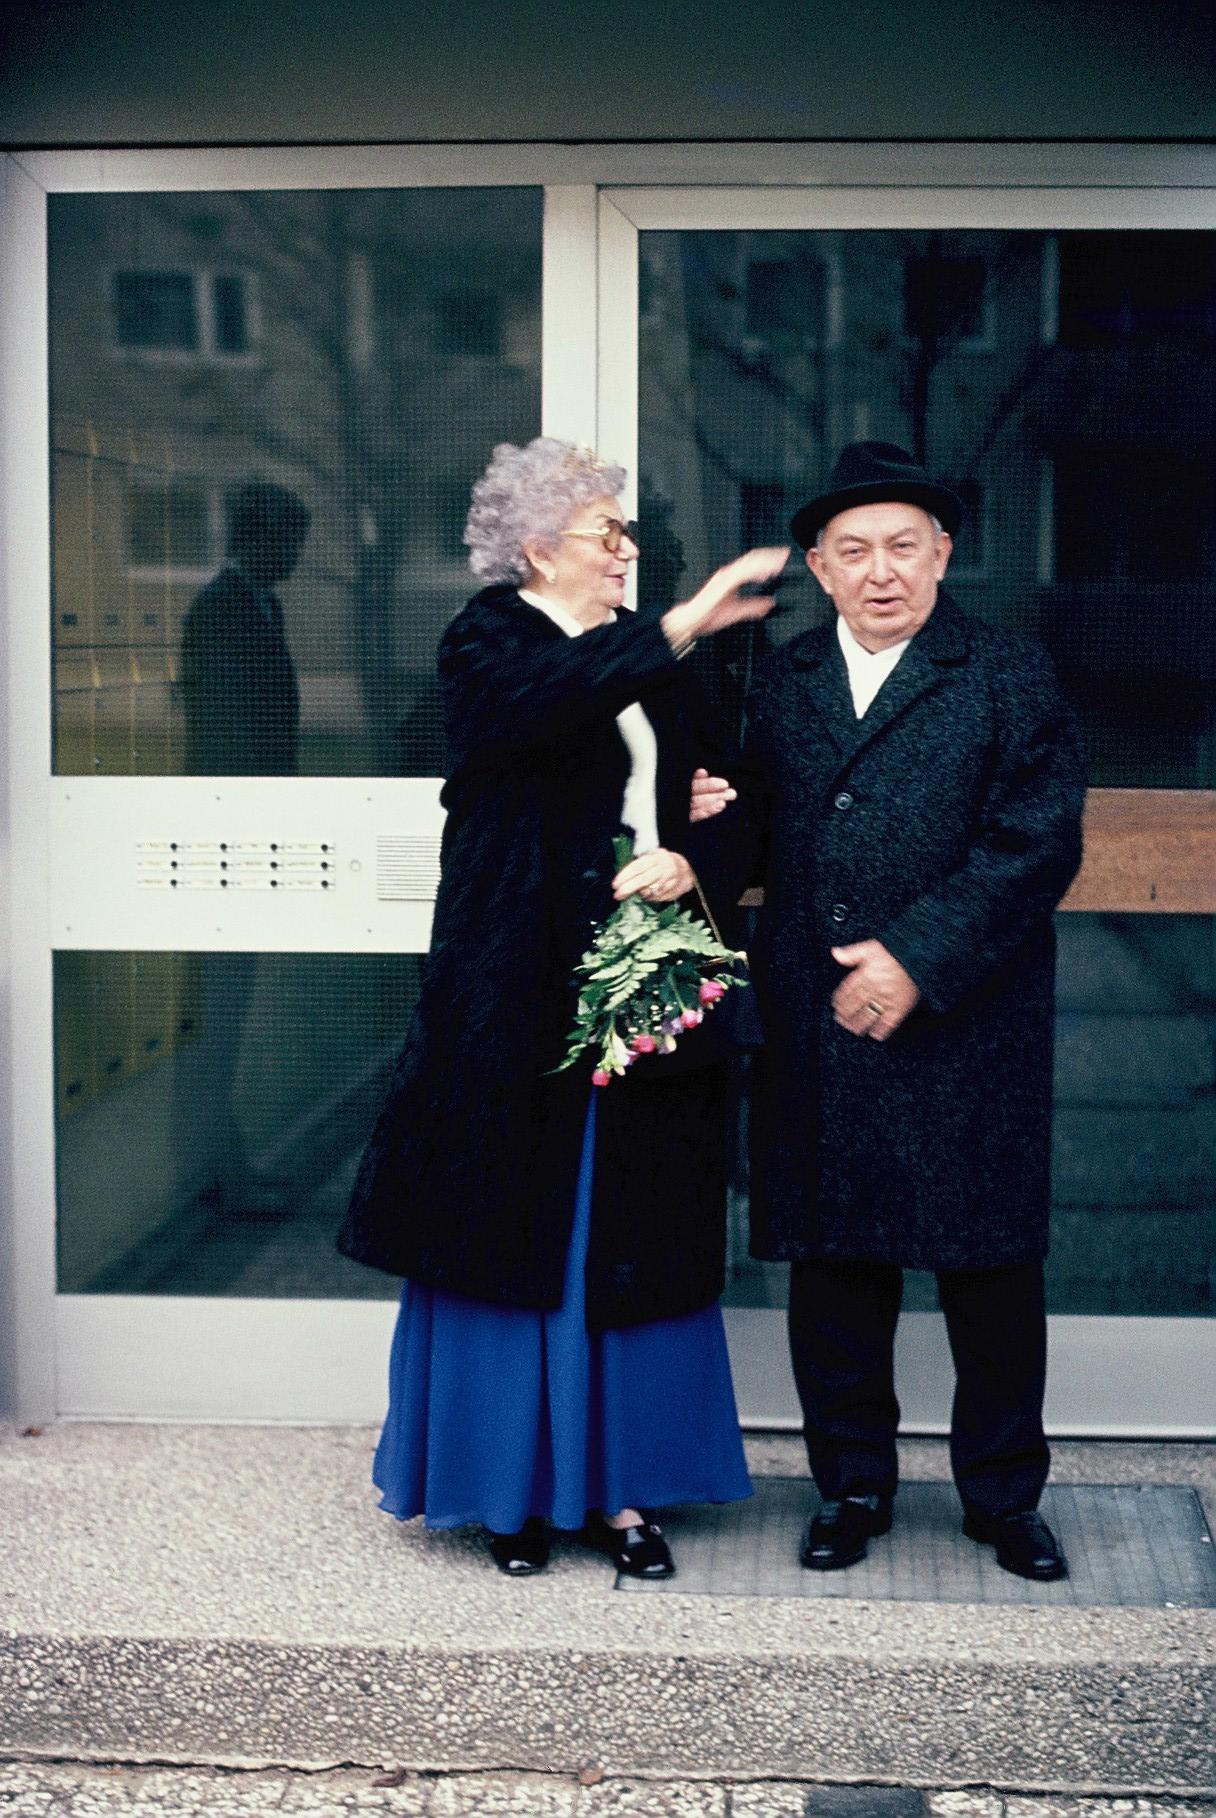 pension abzüge stabsfeldwebel